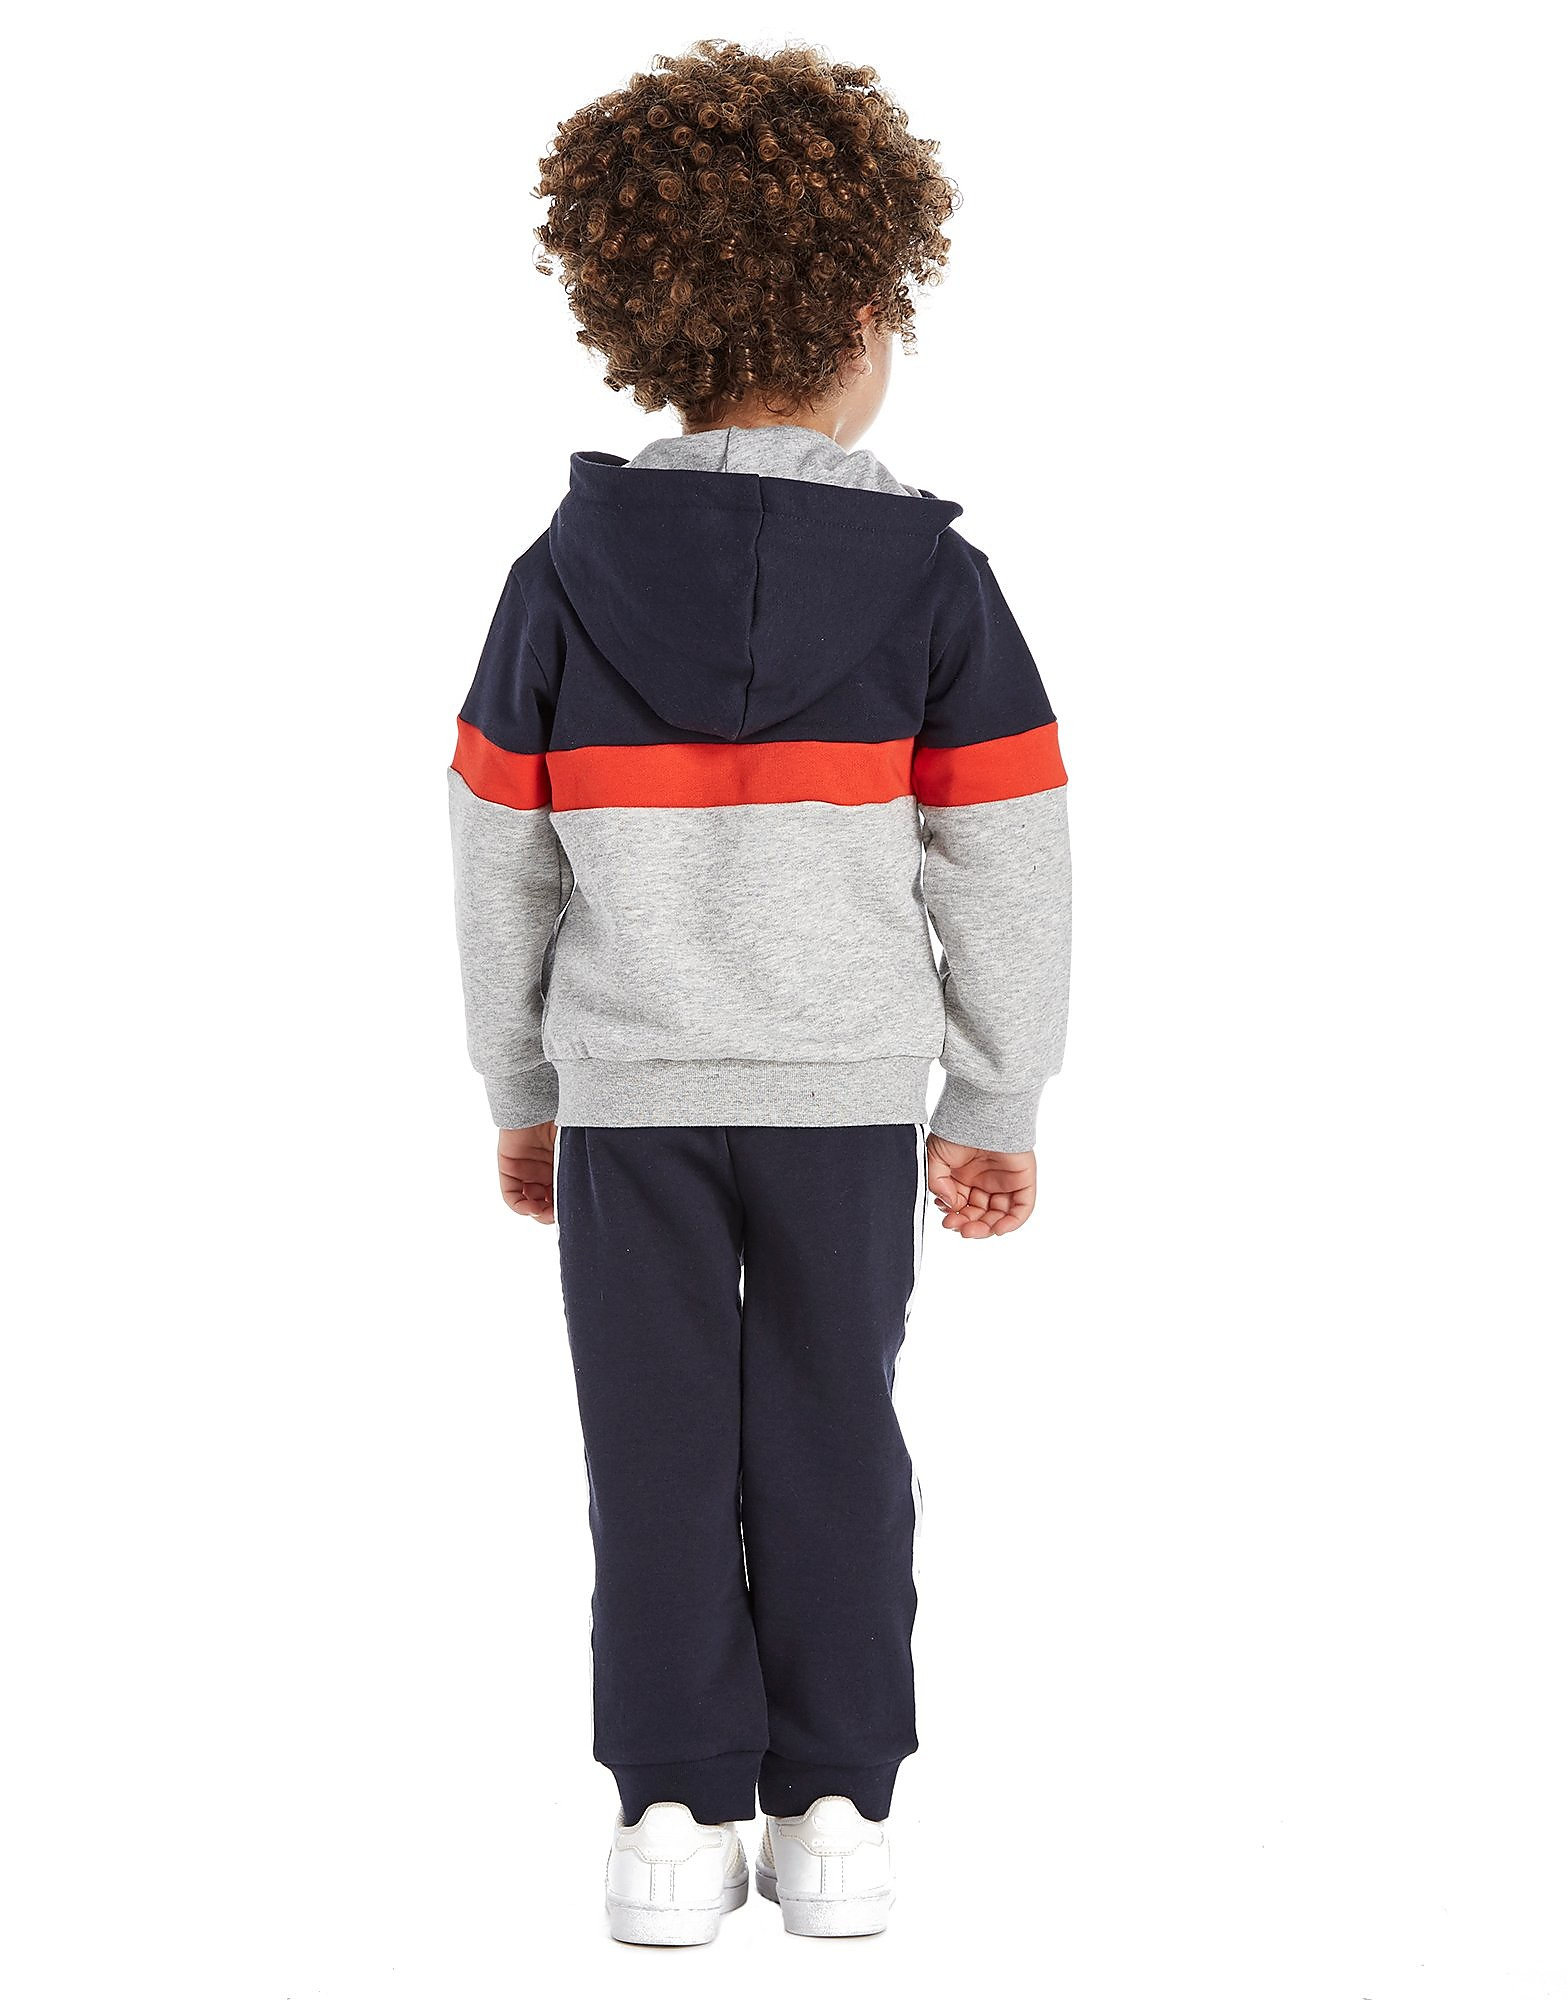 adidas Originals Itasca Hooded Suit Infant